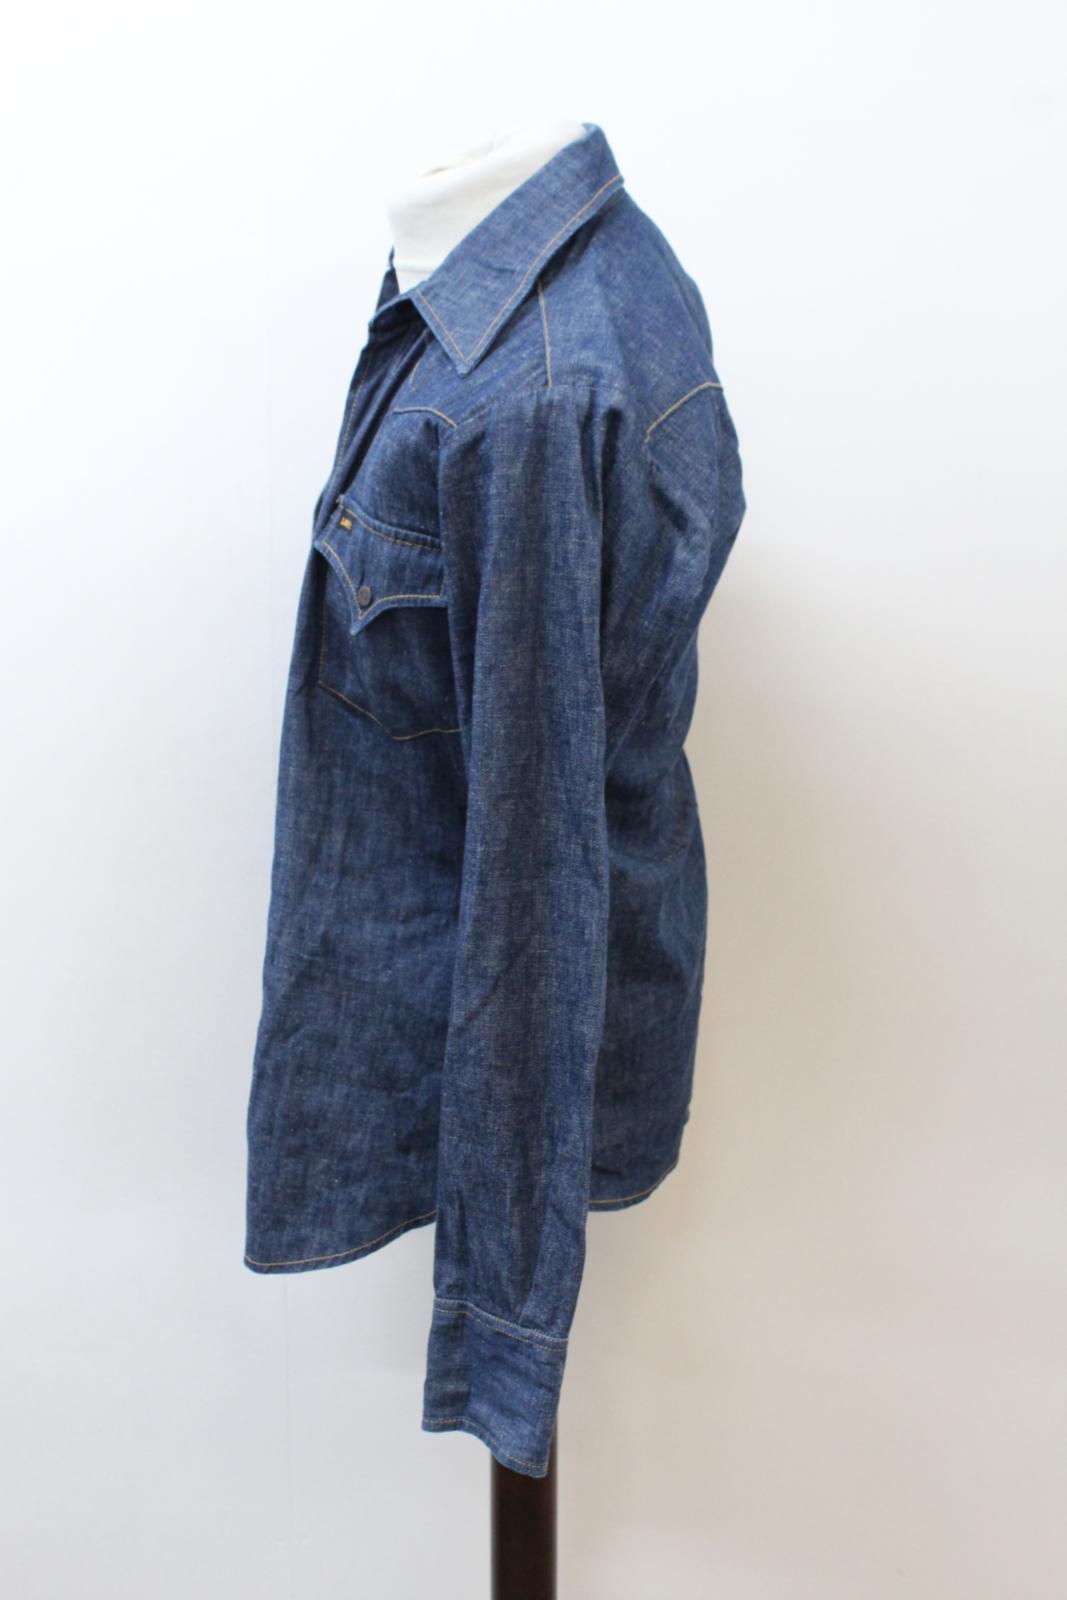 Lee-Jeans-de-hombre-Vintage-Denim-Azul-Algodon-con-Corchetes-Cierre-Mangas-Largas-Camisa-S miniatura 3